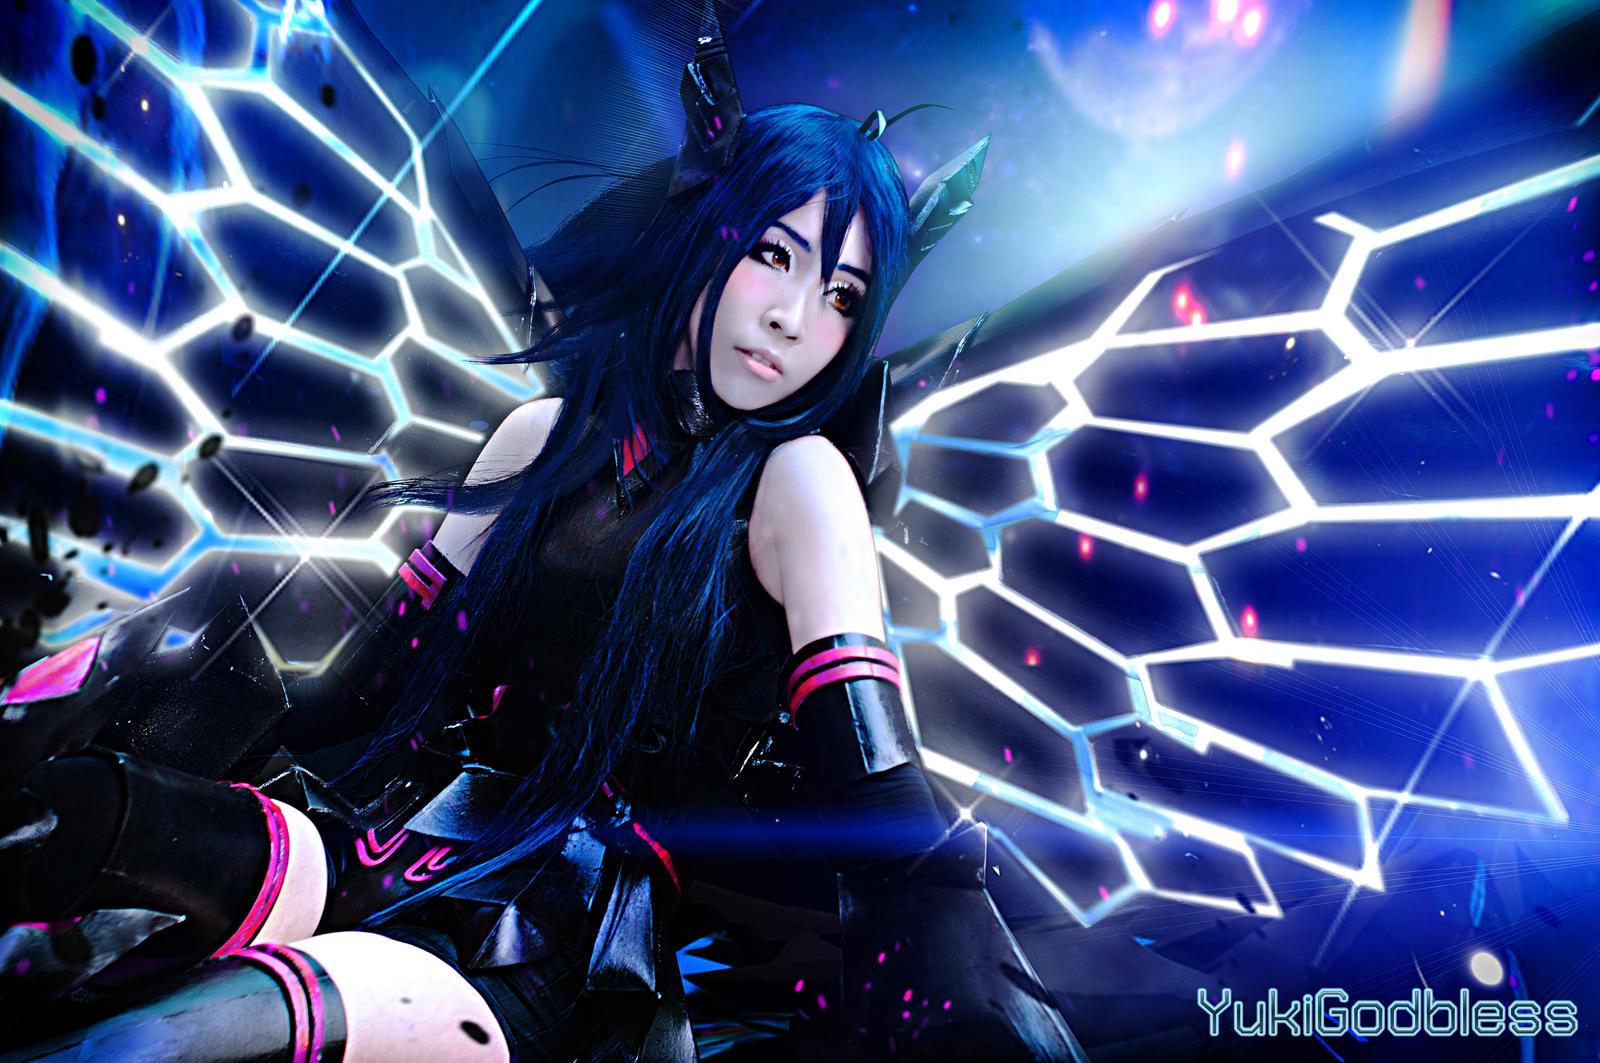 Accel World - Black Lotus cosplay by yukigodbless